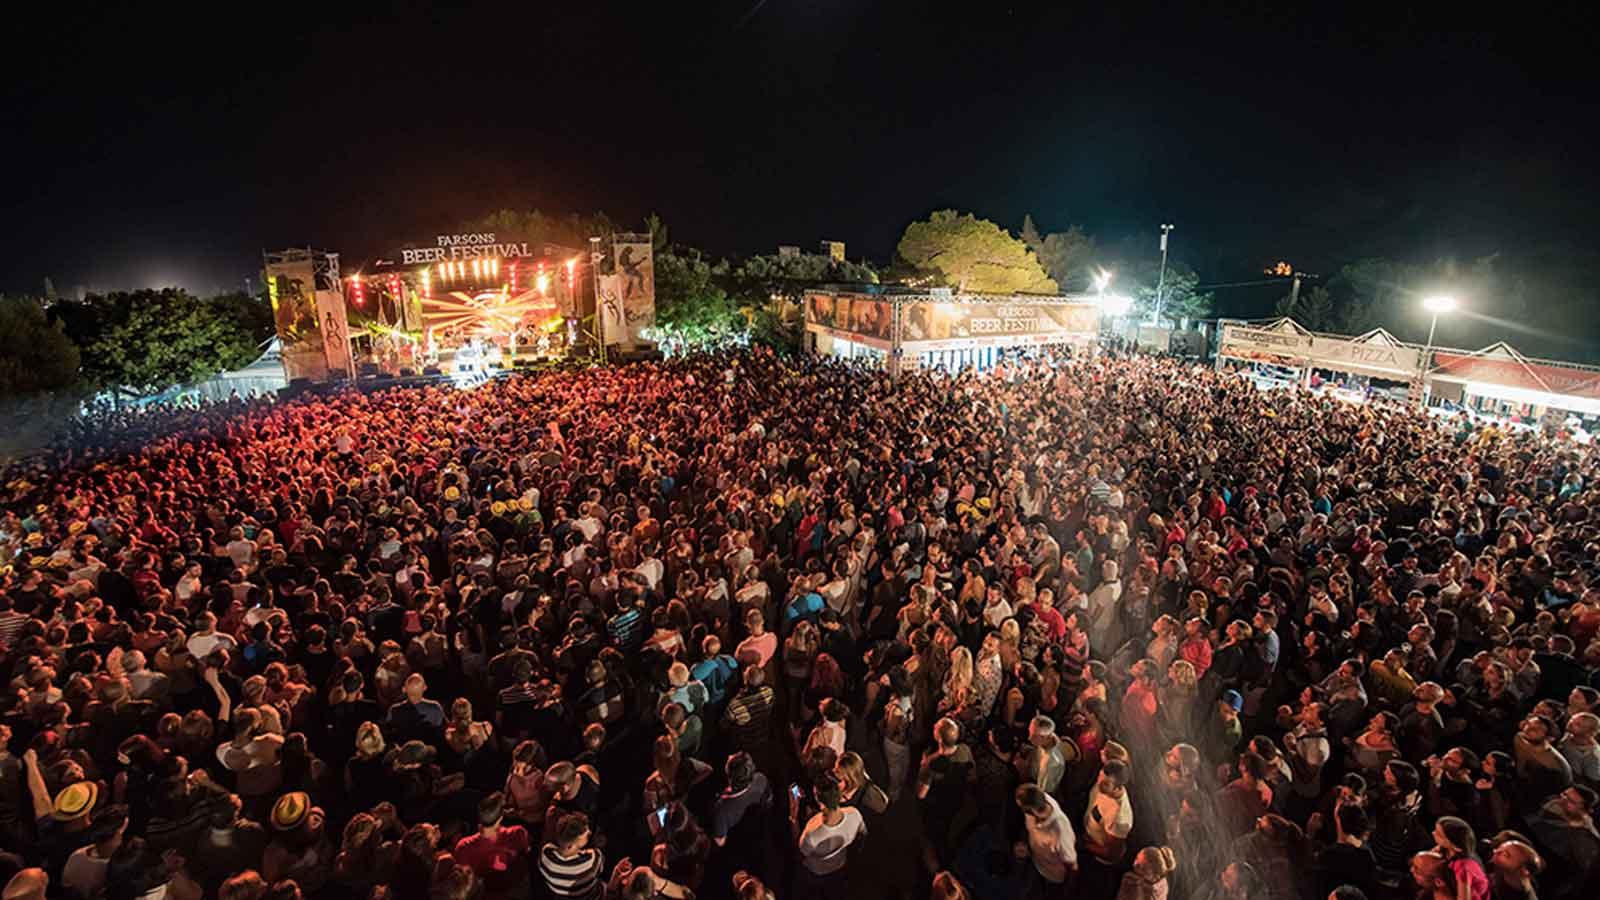 farson beer festival